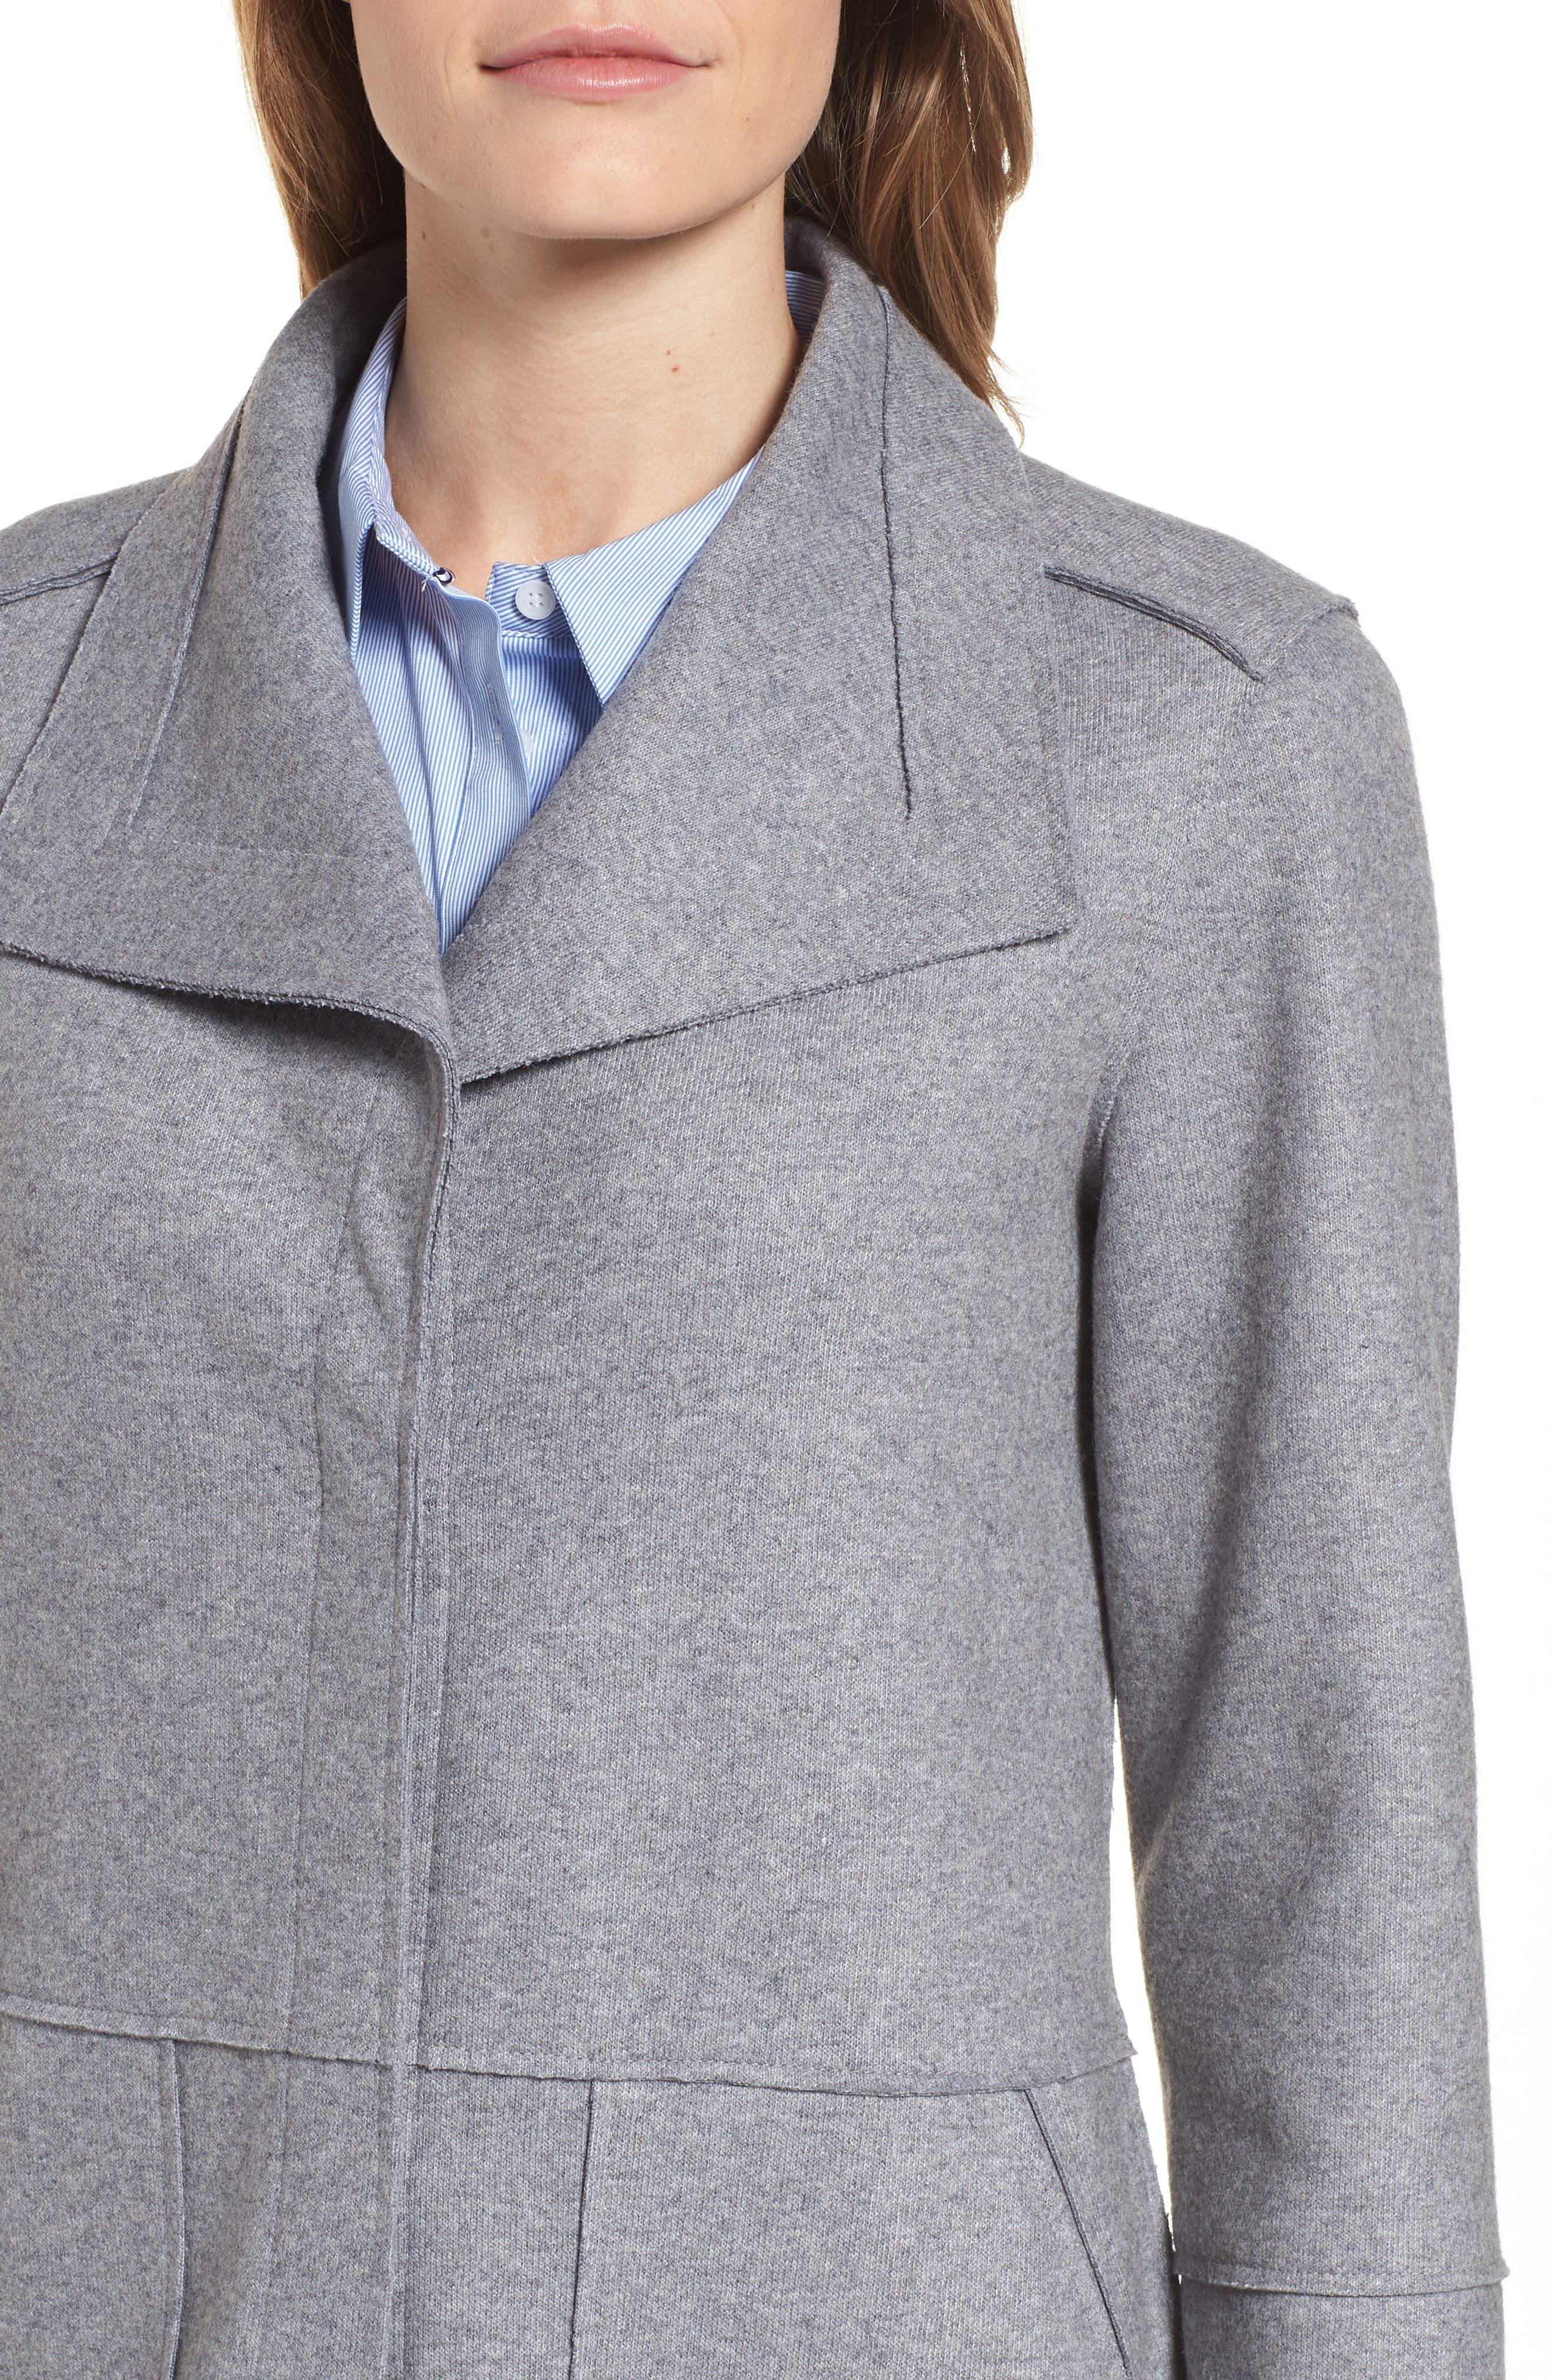 KENNETH COLE NEW YORK,                             Envelope Collar Wool Blend Knit Coat,                             Alternate thumbnail 5, color,                             033